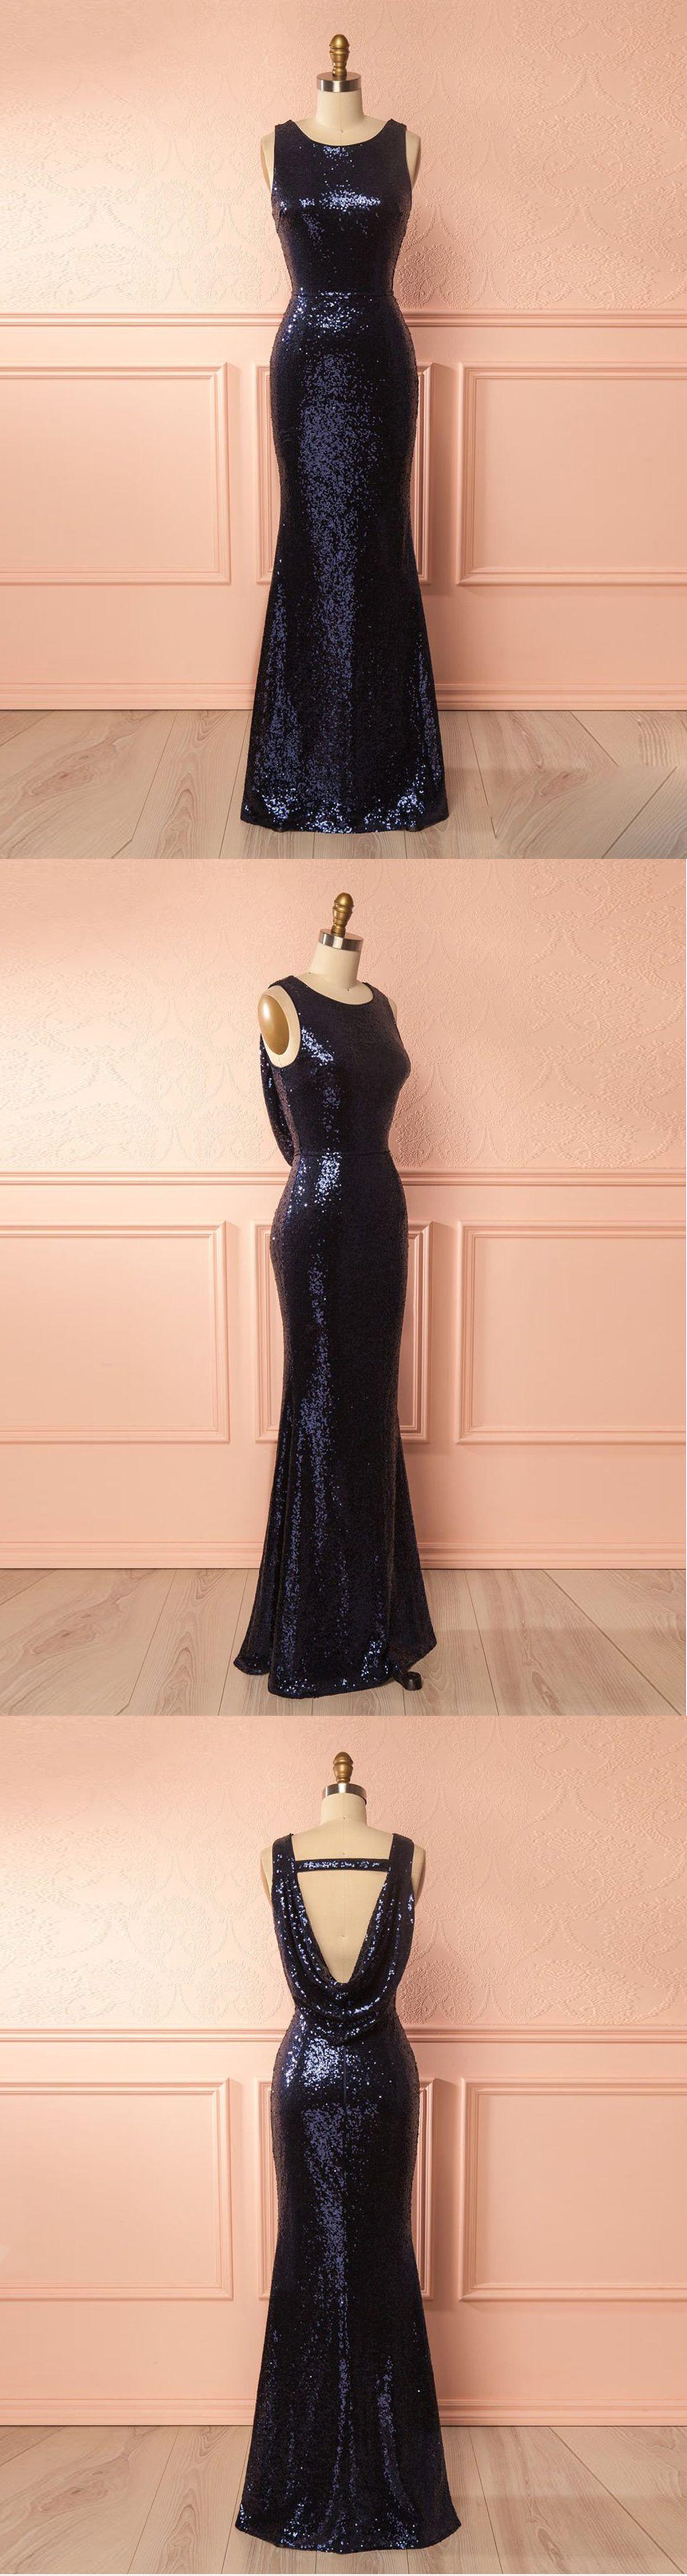 Navy blue sequins long slim open back halter evening dress from